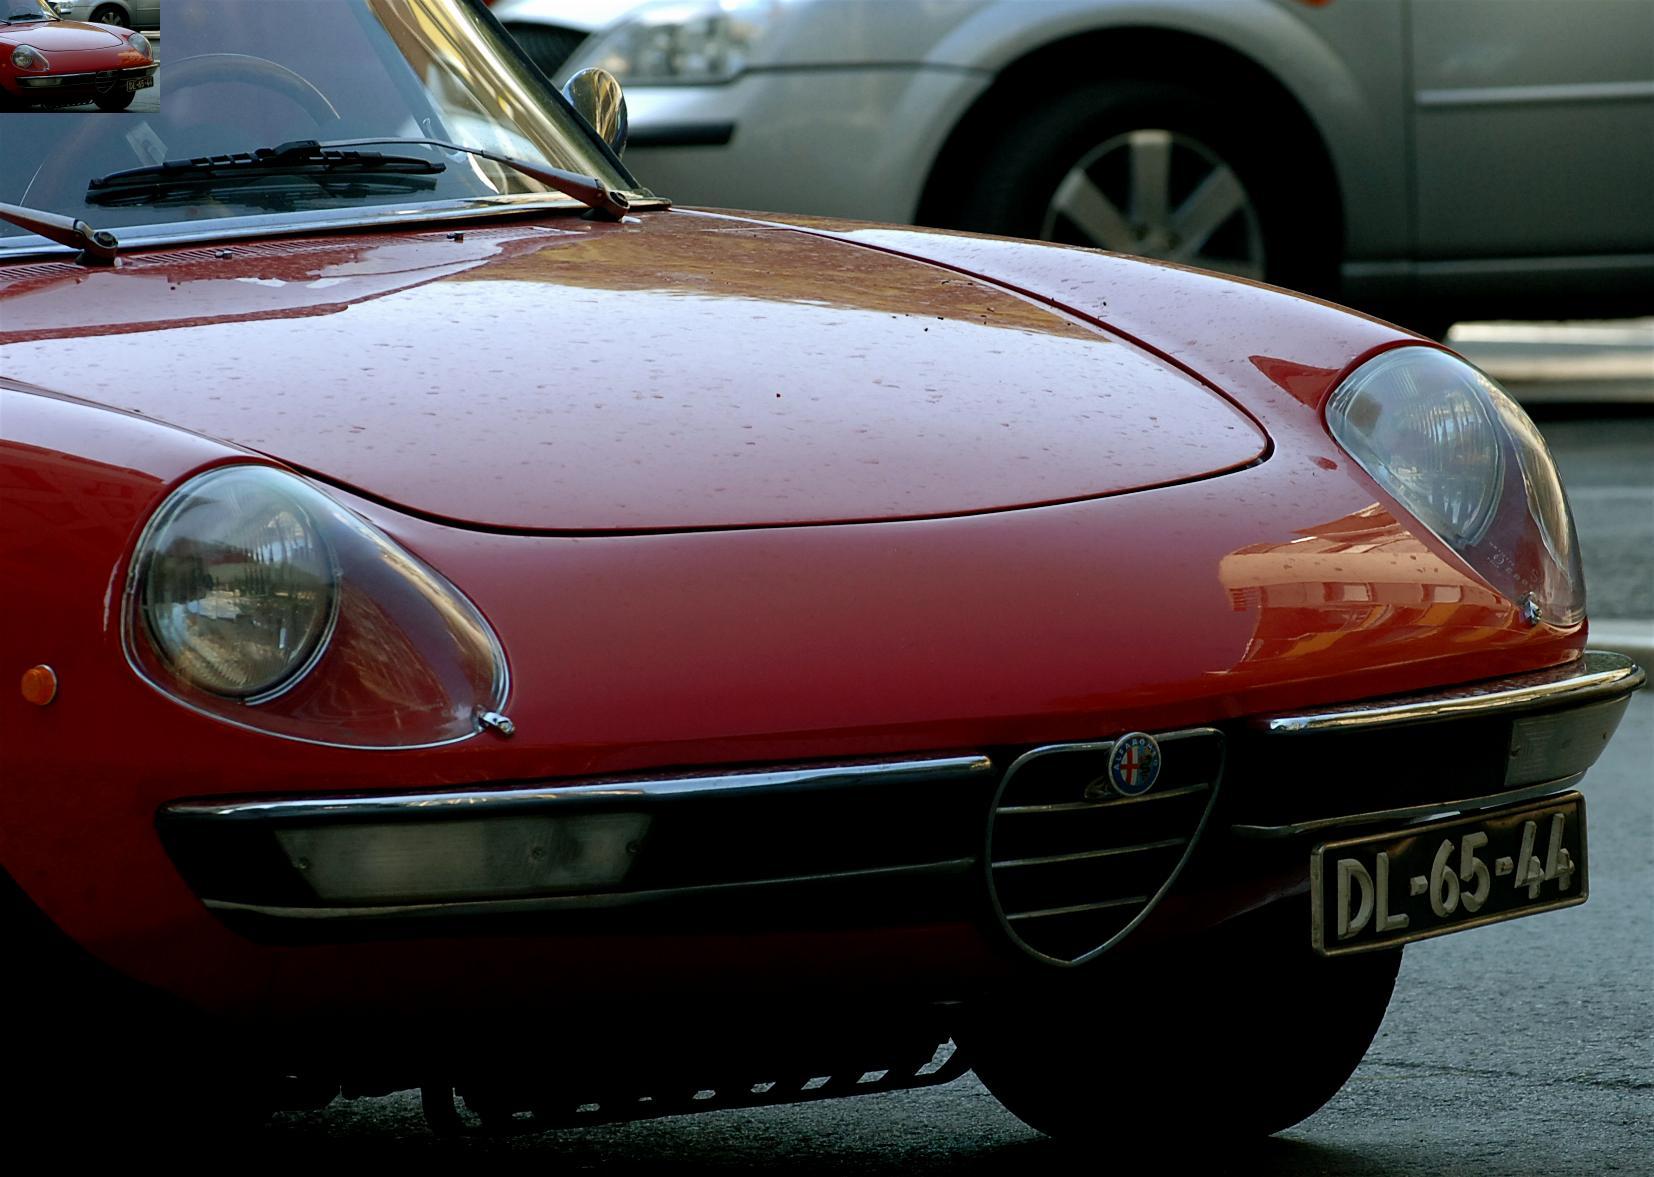 File:Red Alfa Romeo Spider in Lisbon.jpg - Wikimedia Commons